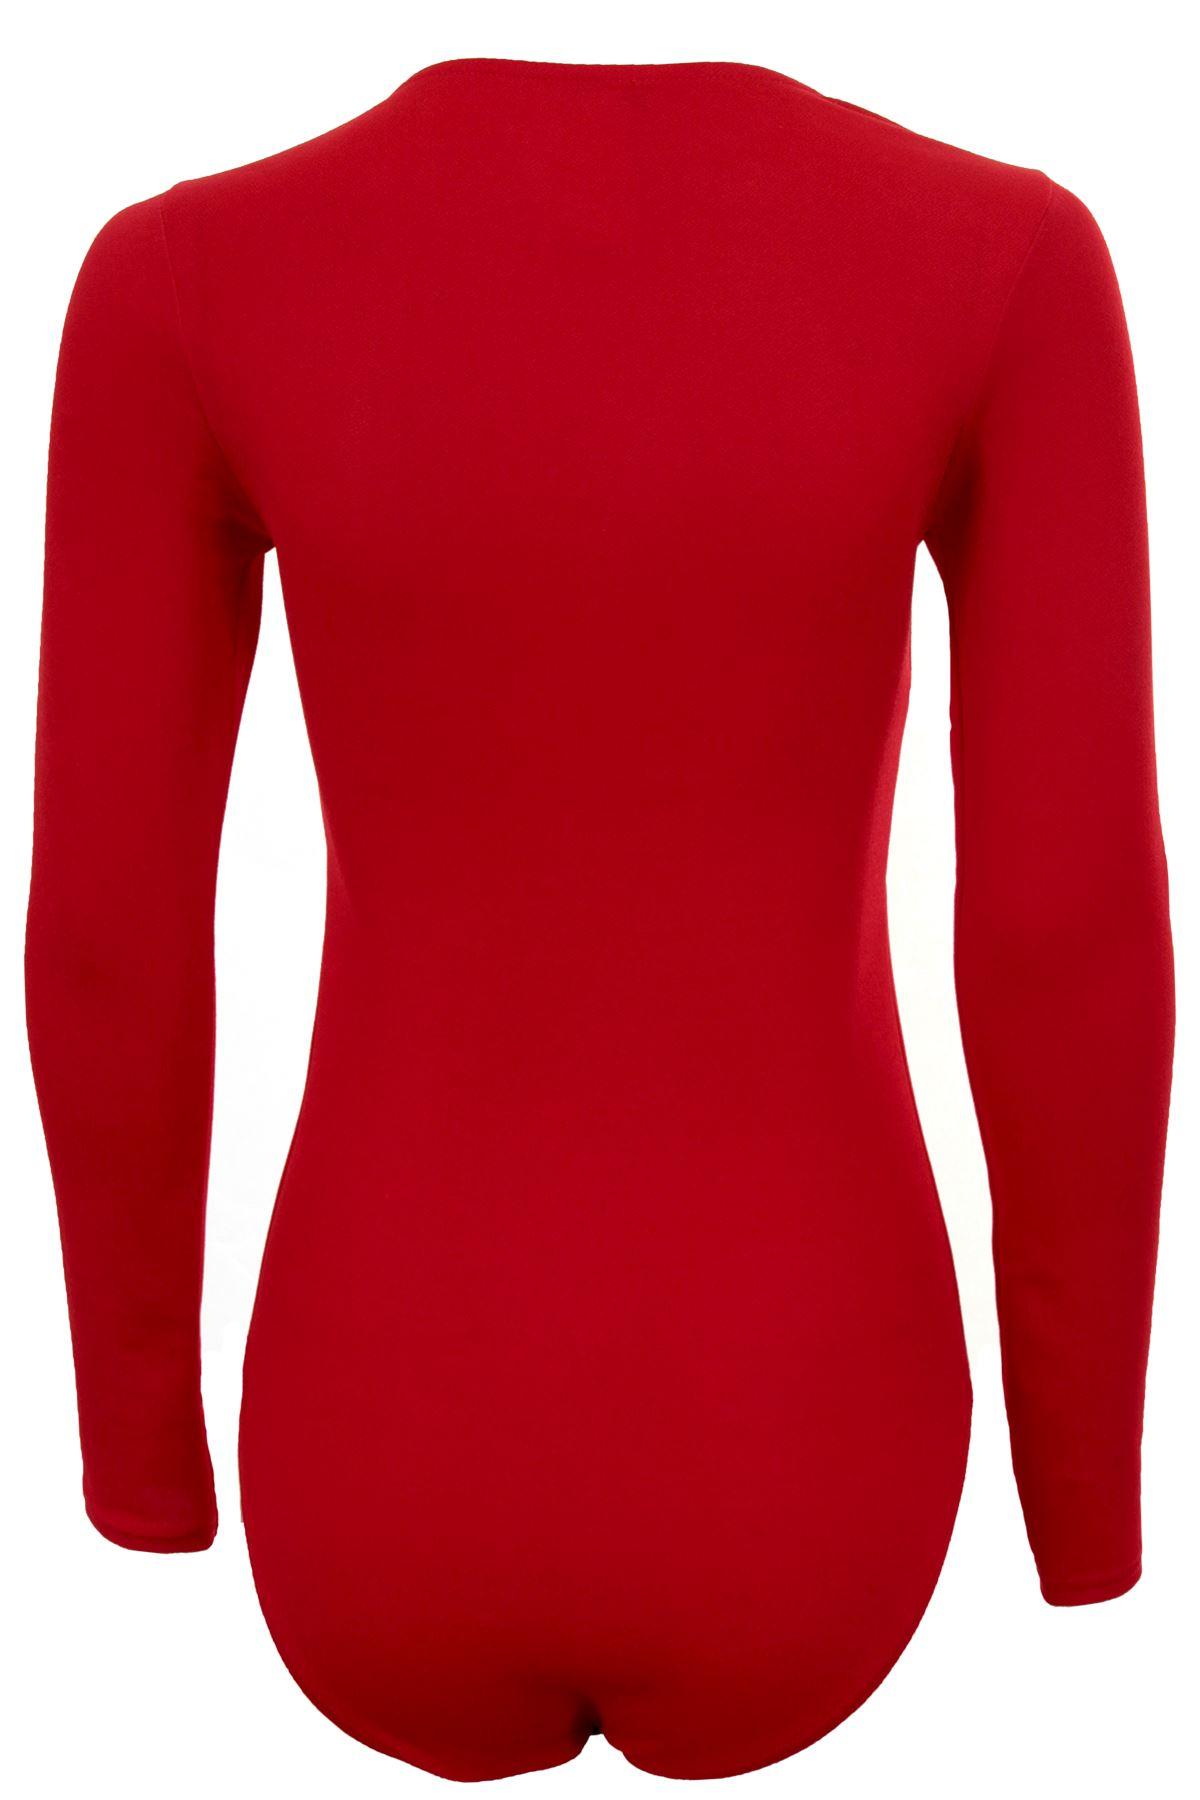 Women/'s Adjustable Lace Up Front Long Sleeve Textured Plunge Leotard Bodysuit